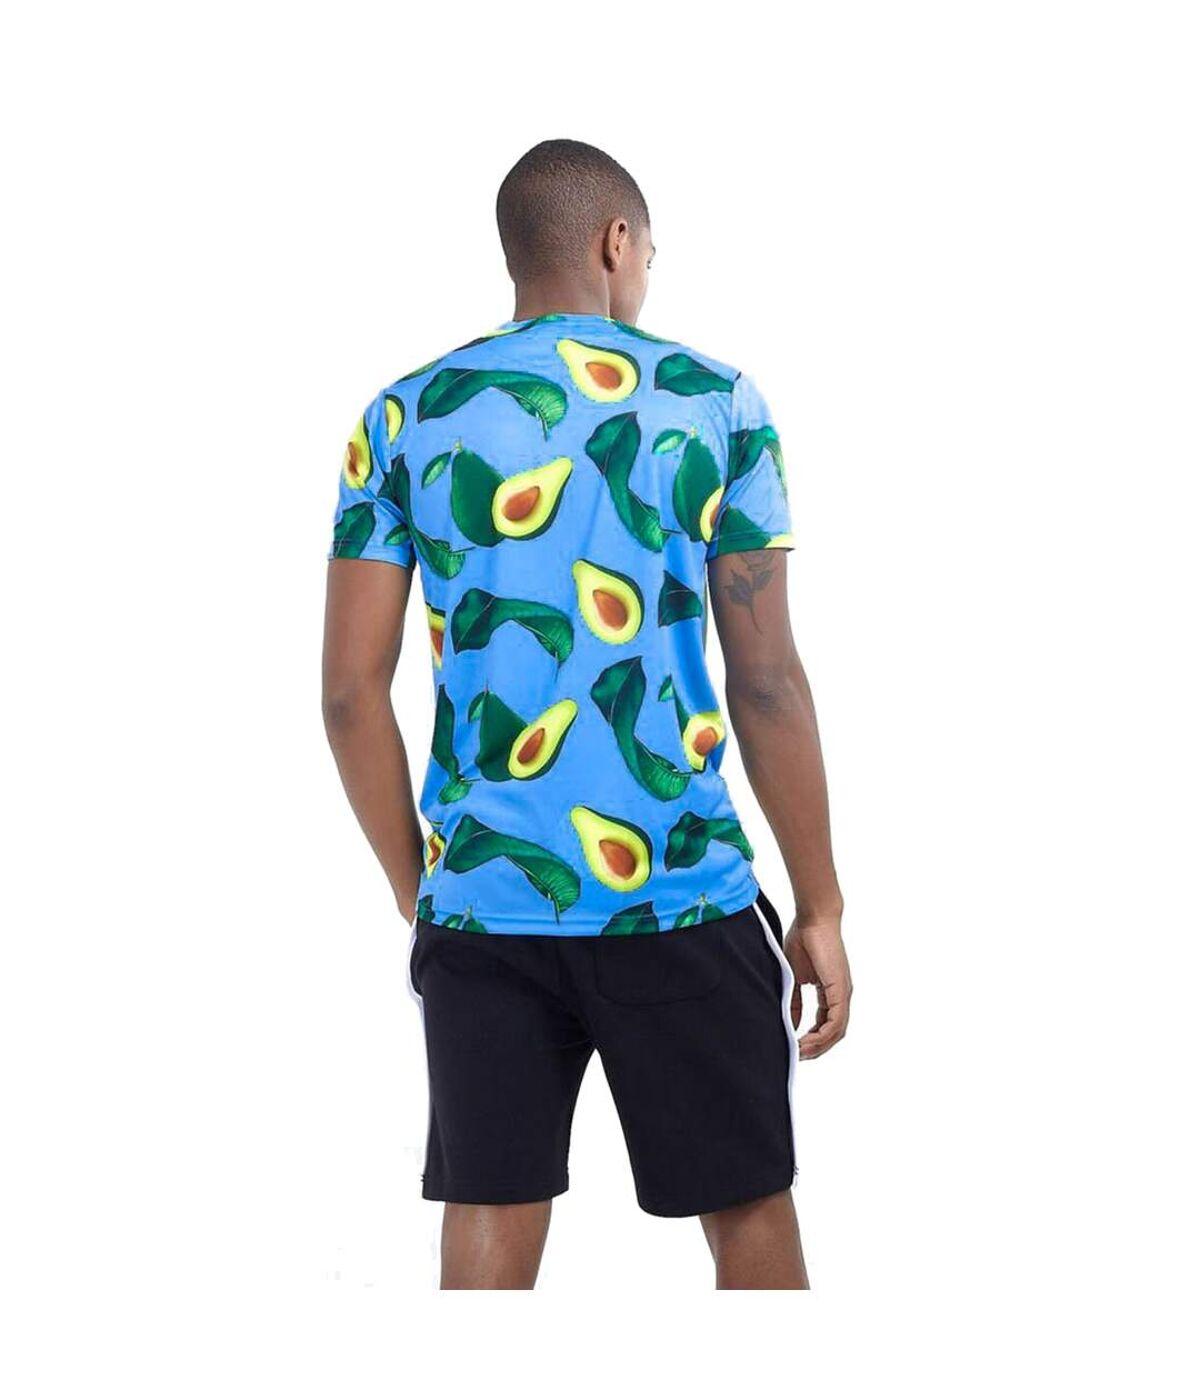 Brave Soul Mens Avocado Print Crew Neck T Shirt (Blue/Avocado) - UTSHIRT392